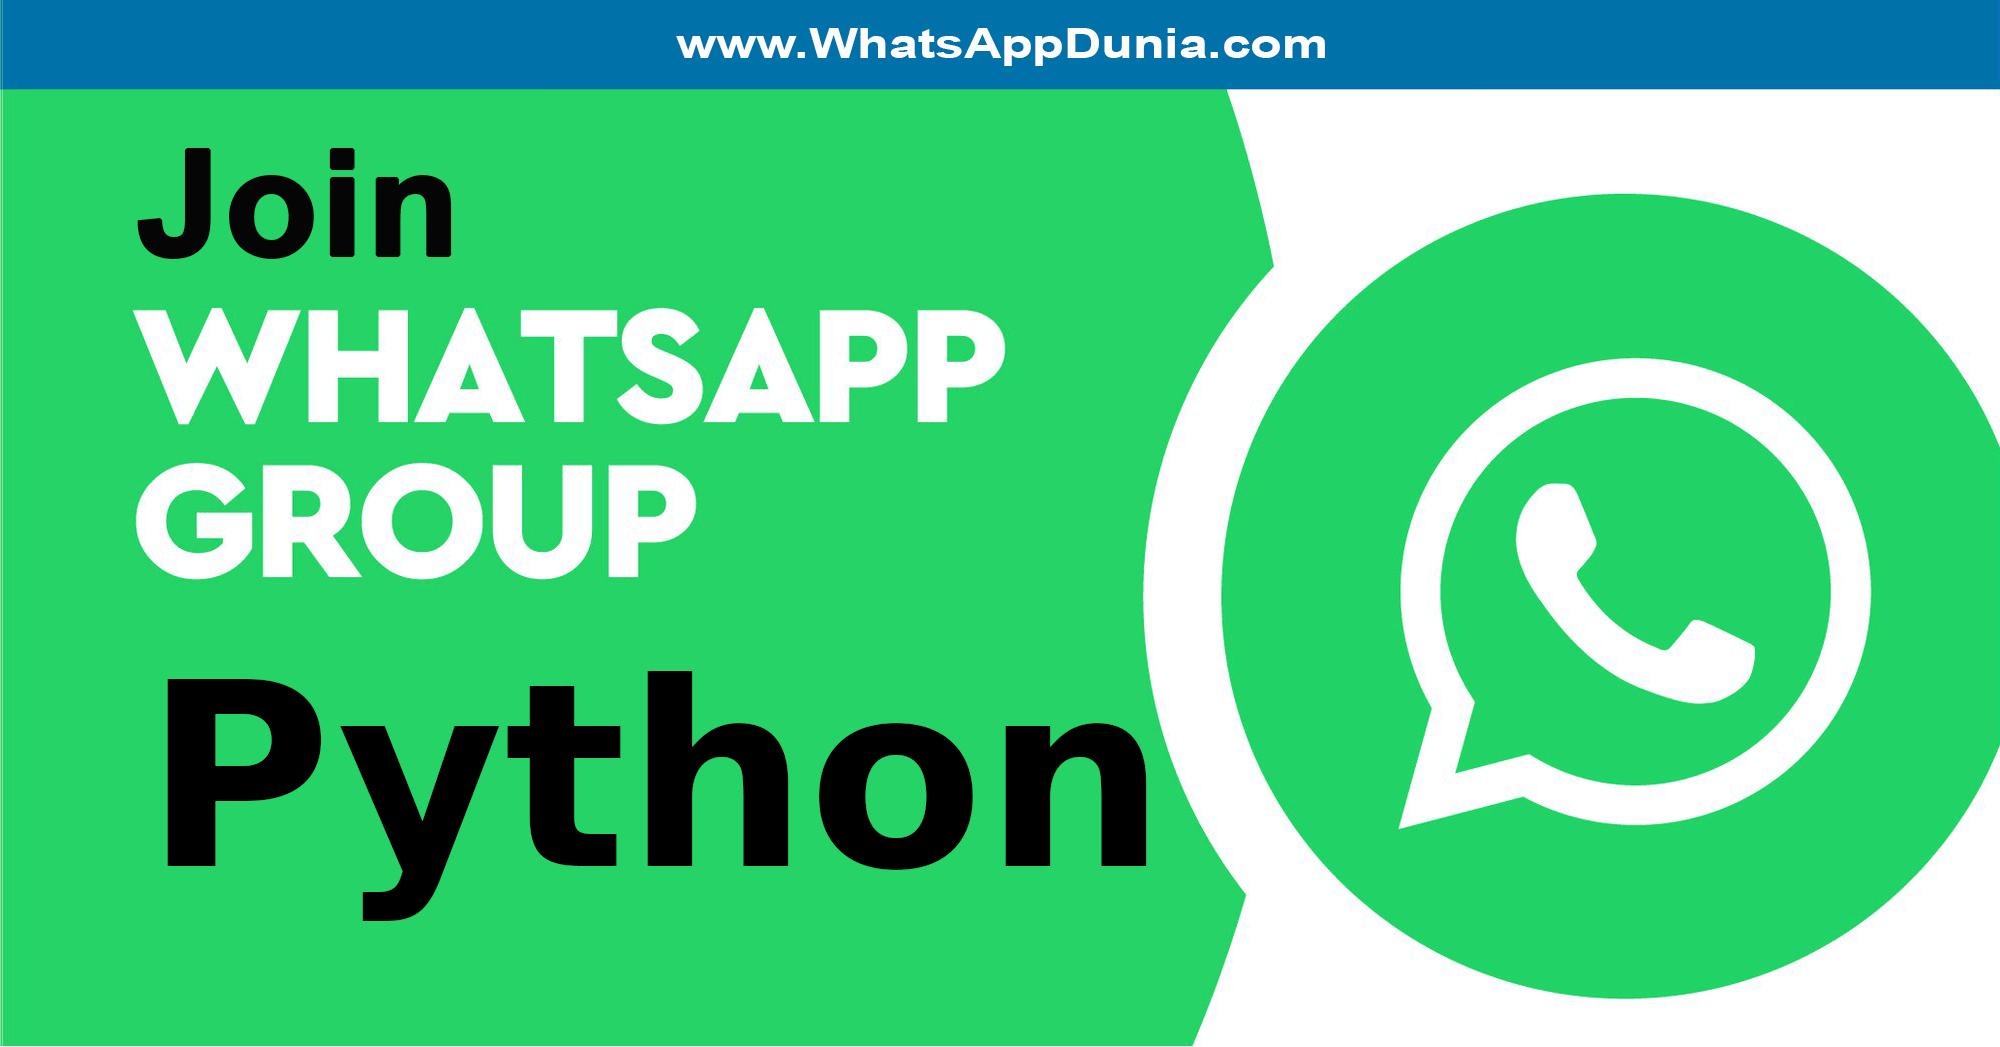 Python WhatsApp Group Links